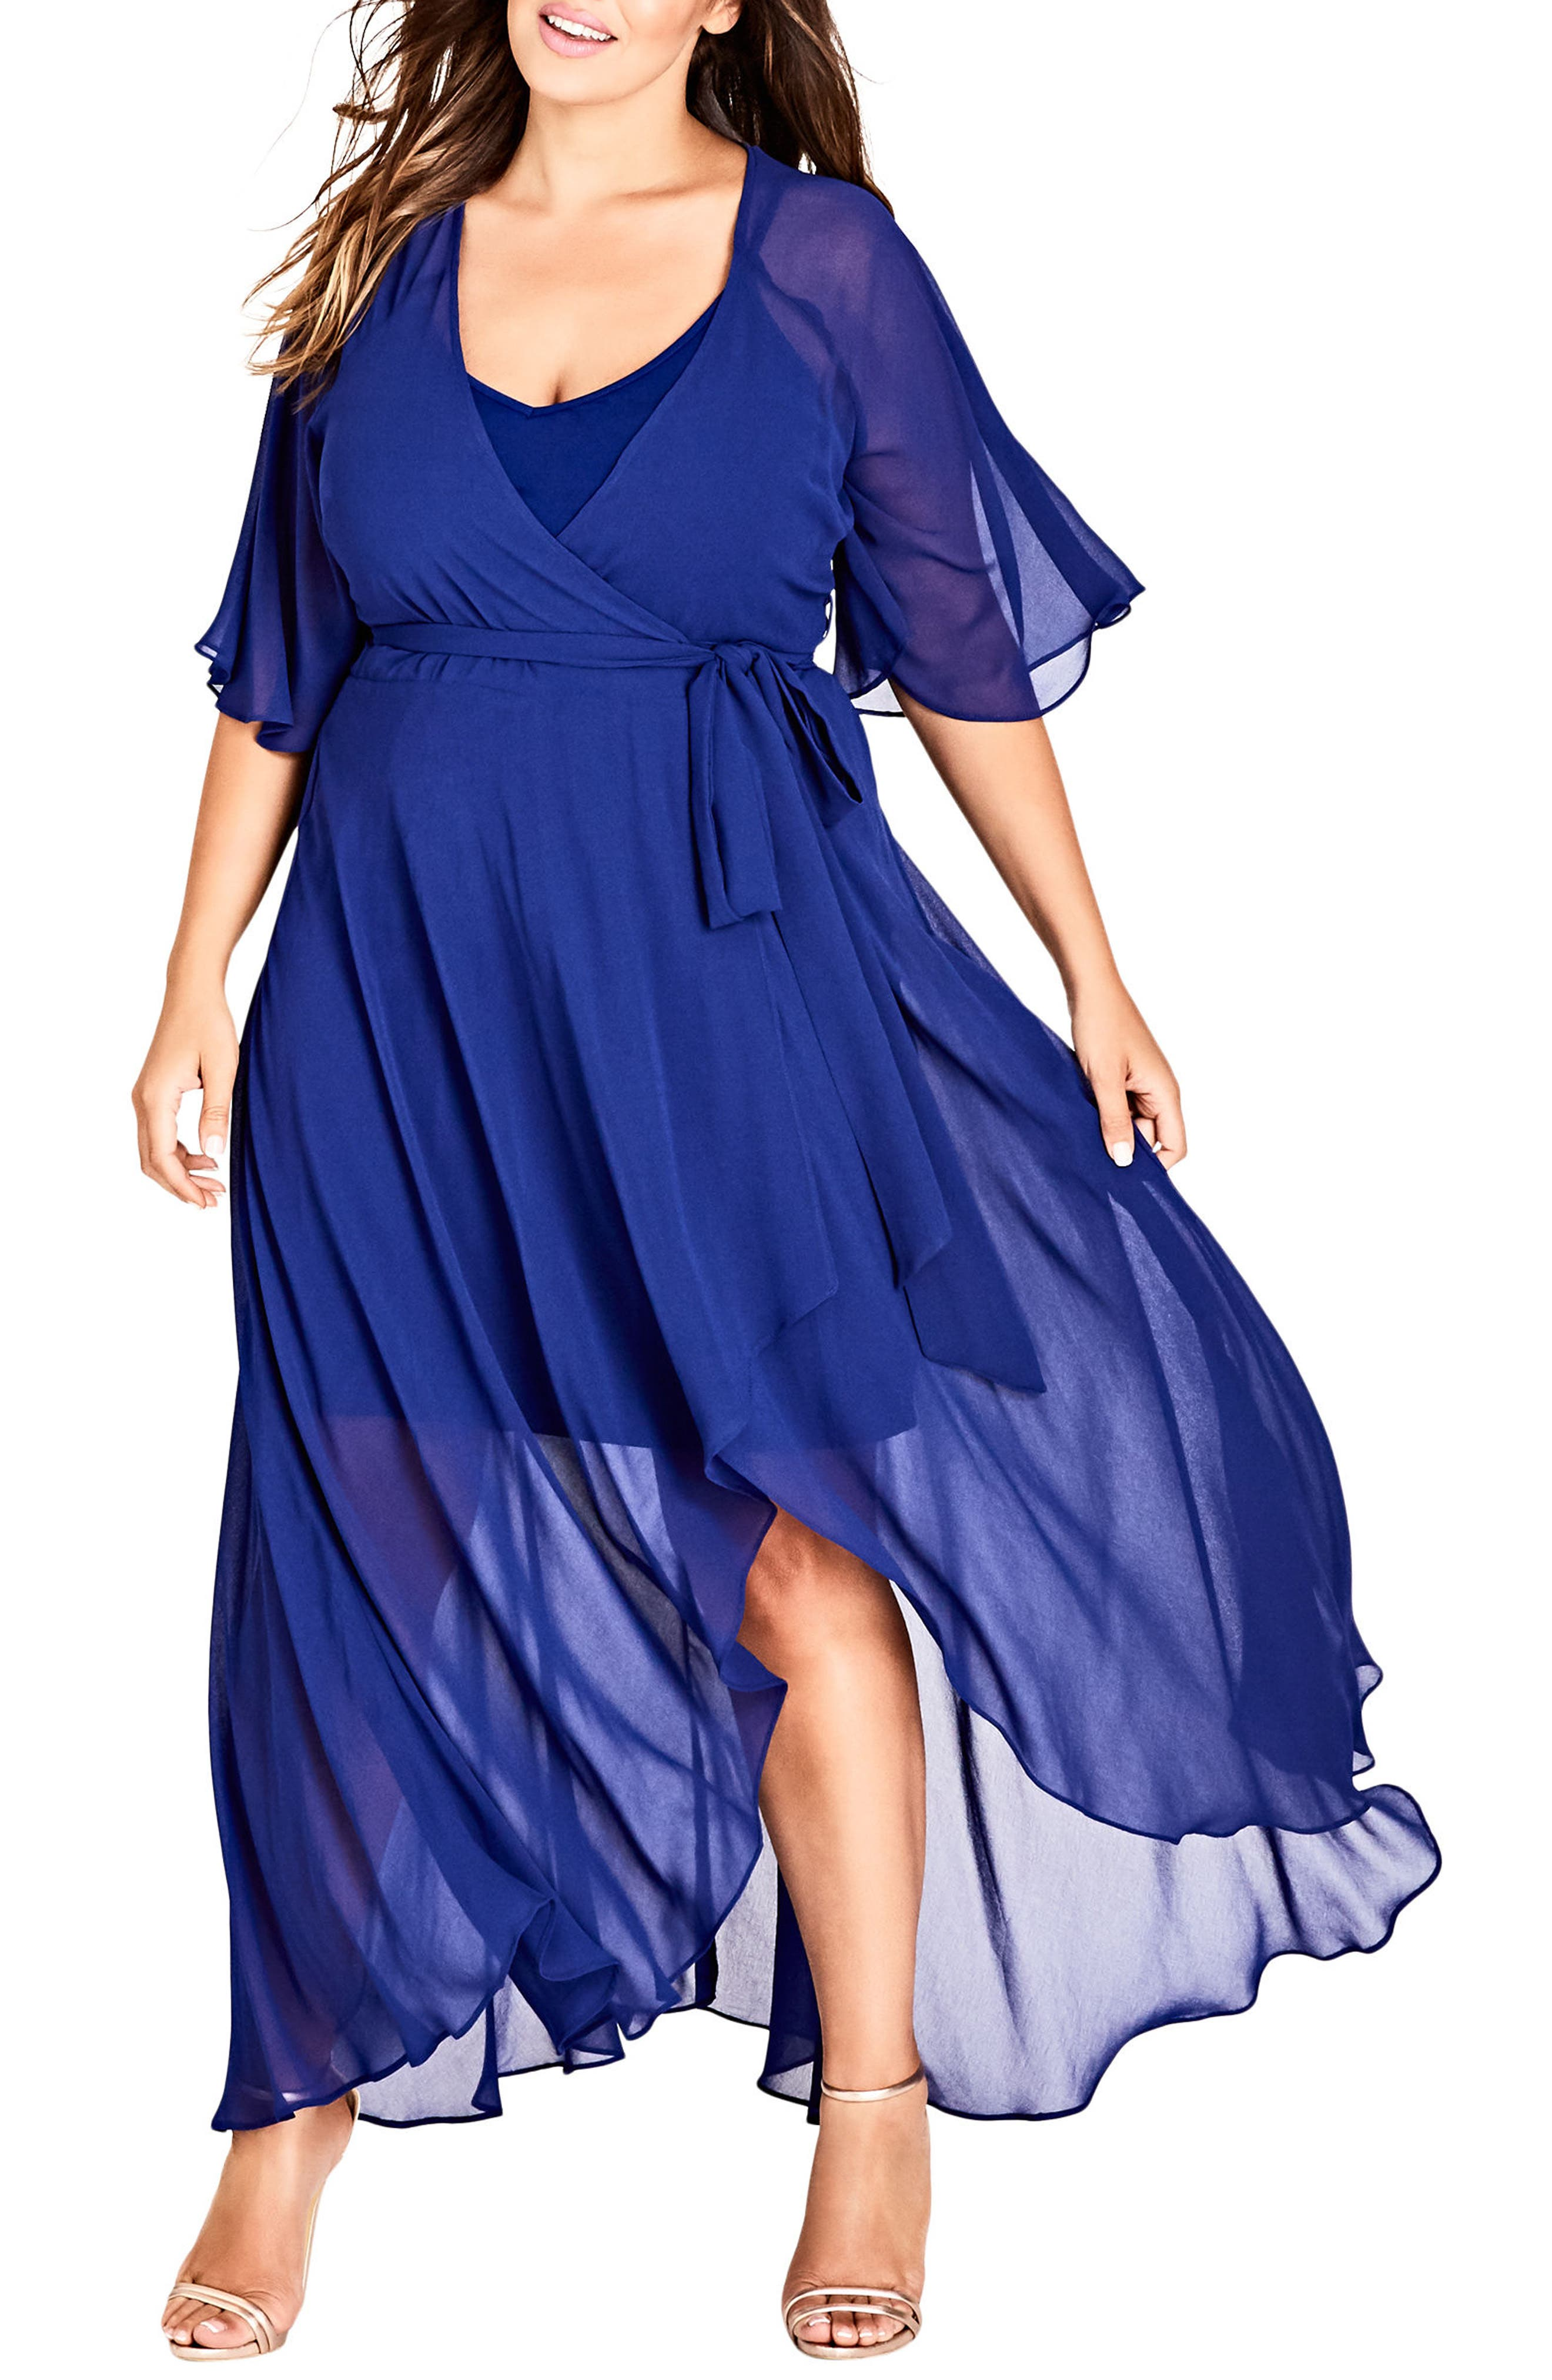 Enthrall Me High/Low Dress,                             Main thumbnail 1, color,                             Lapis